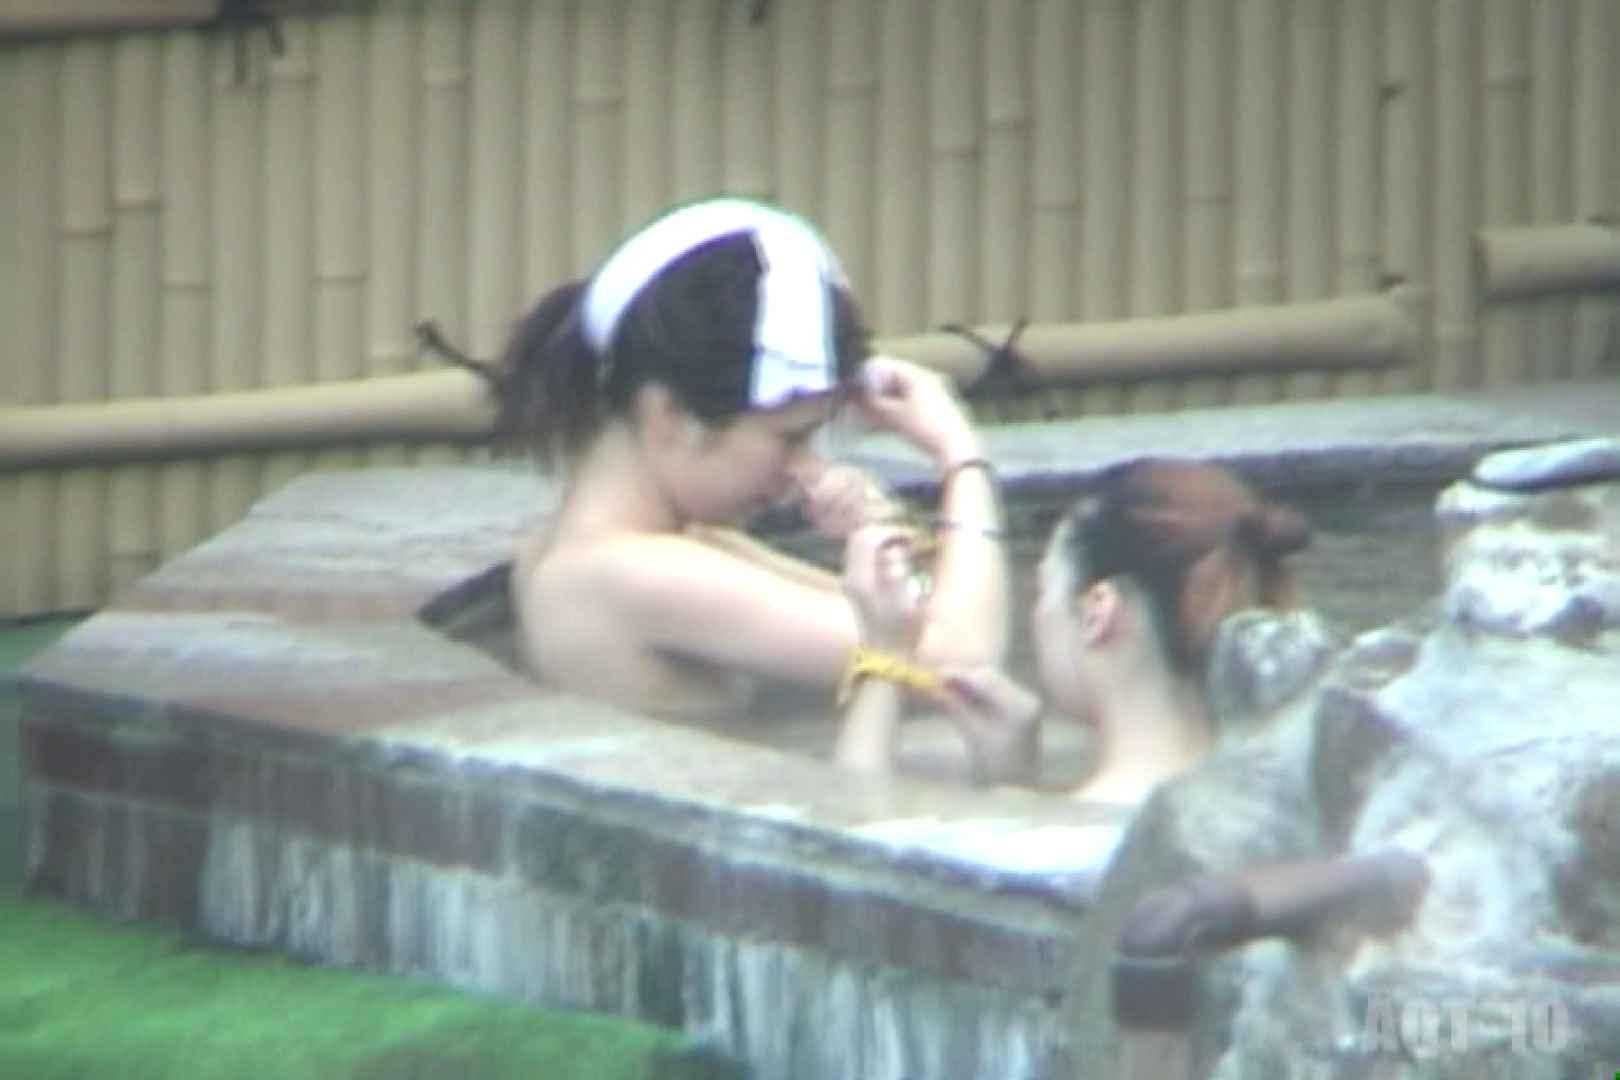 Aquaな露天風呂Vol.792 盗撮   HなOL  103pic 12